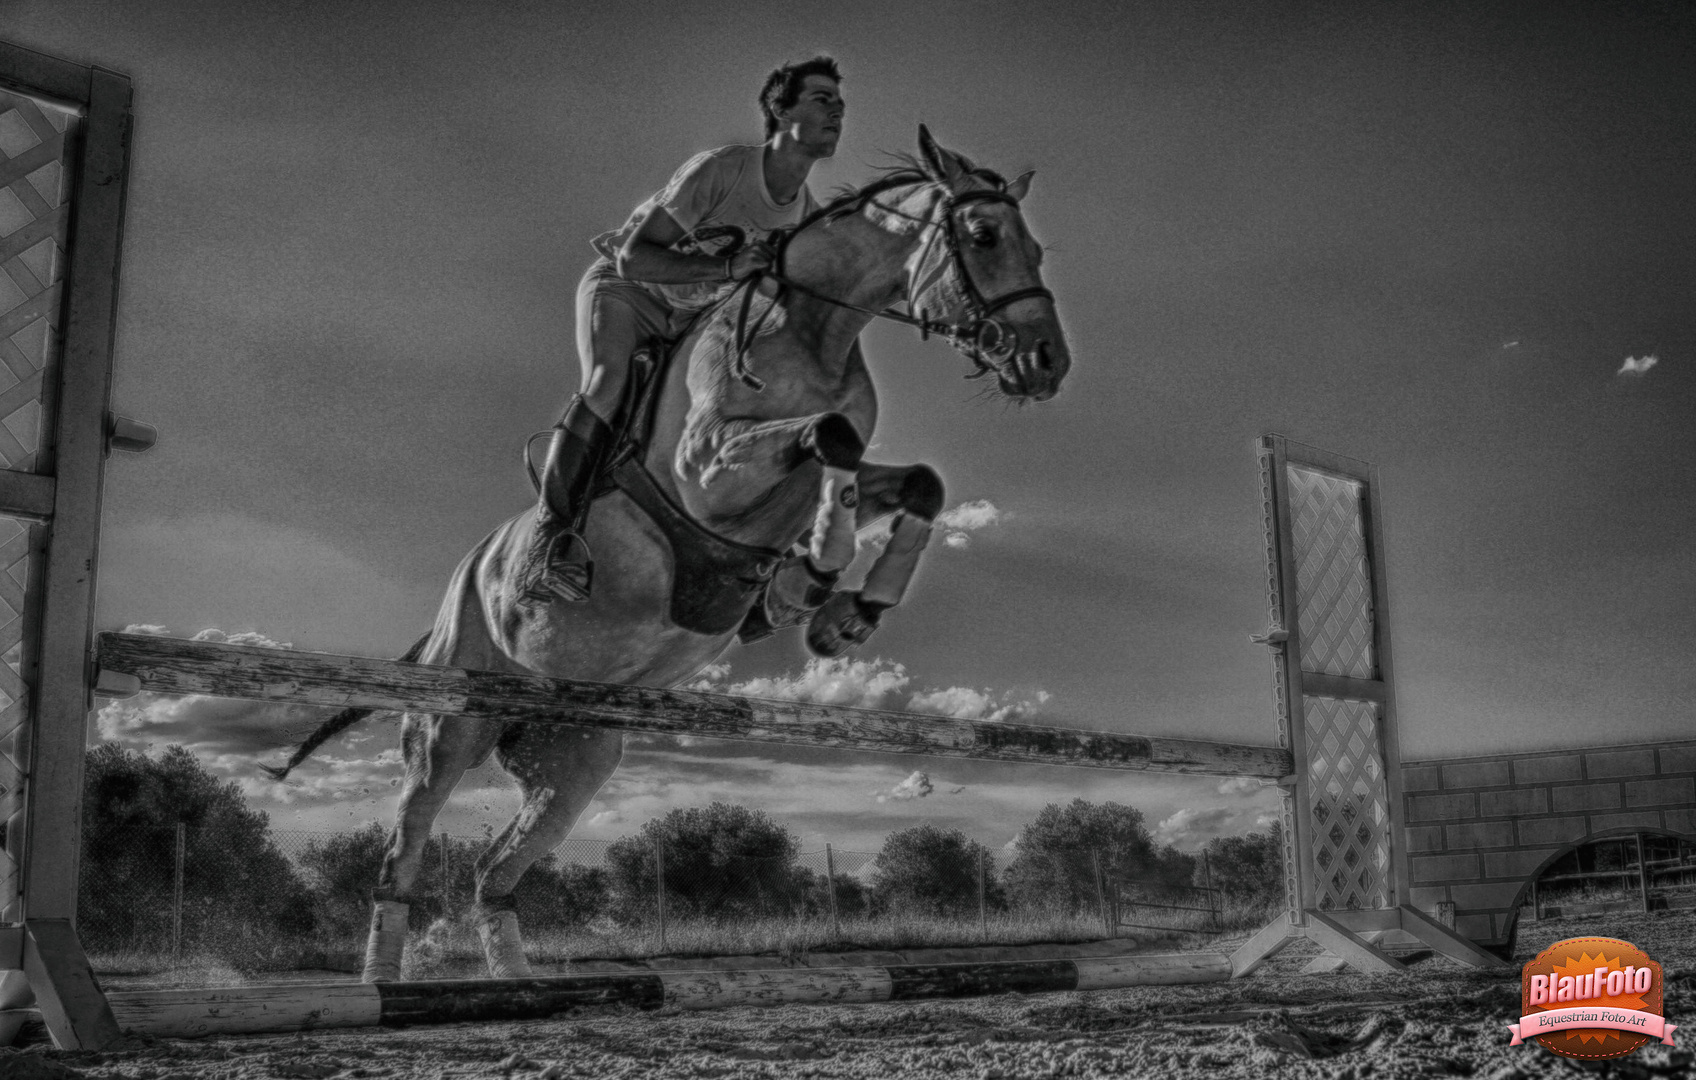 Mein Reining Pferd springt